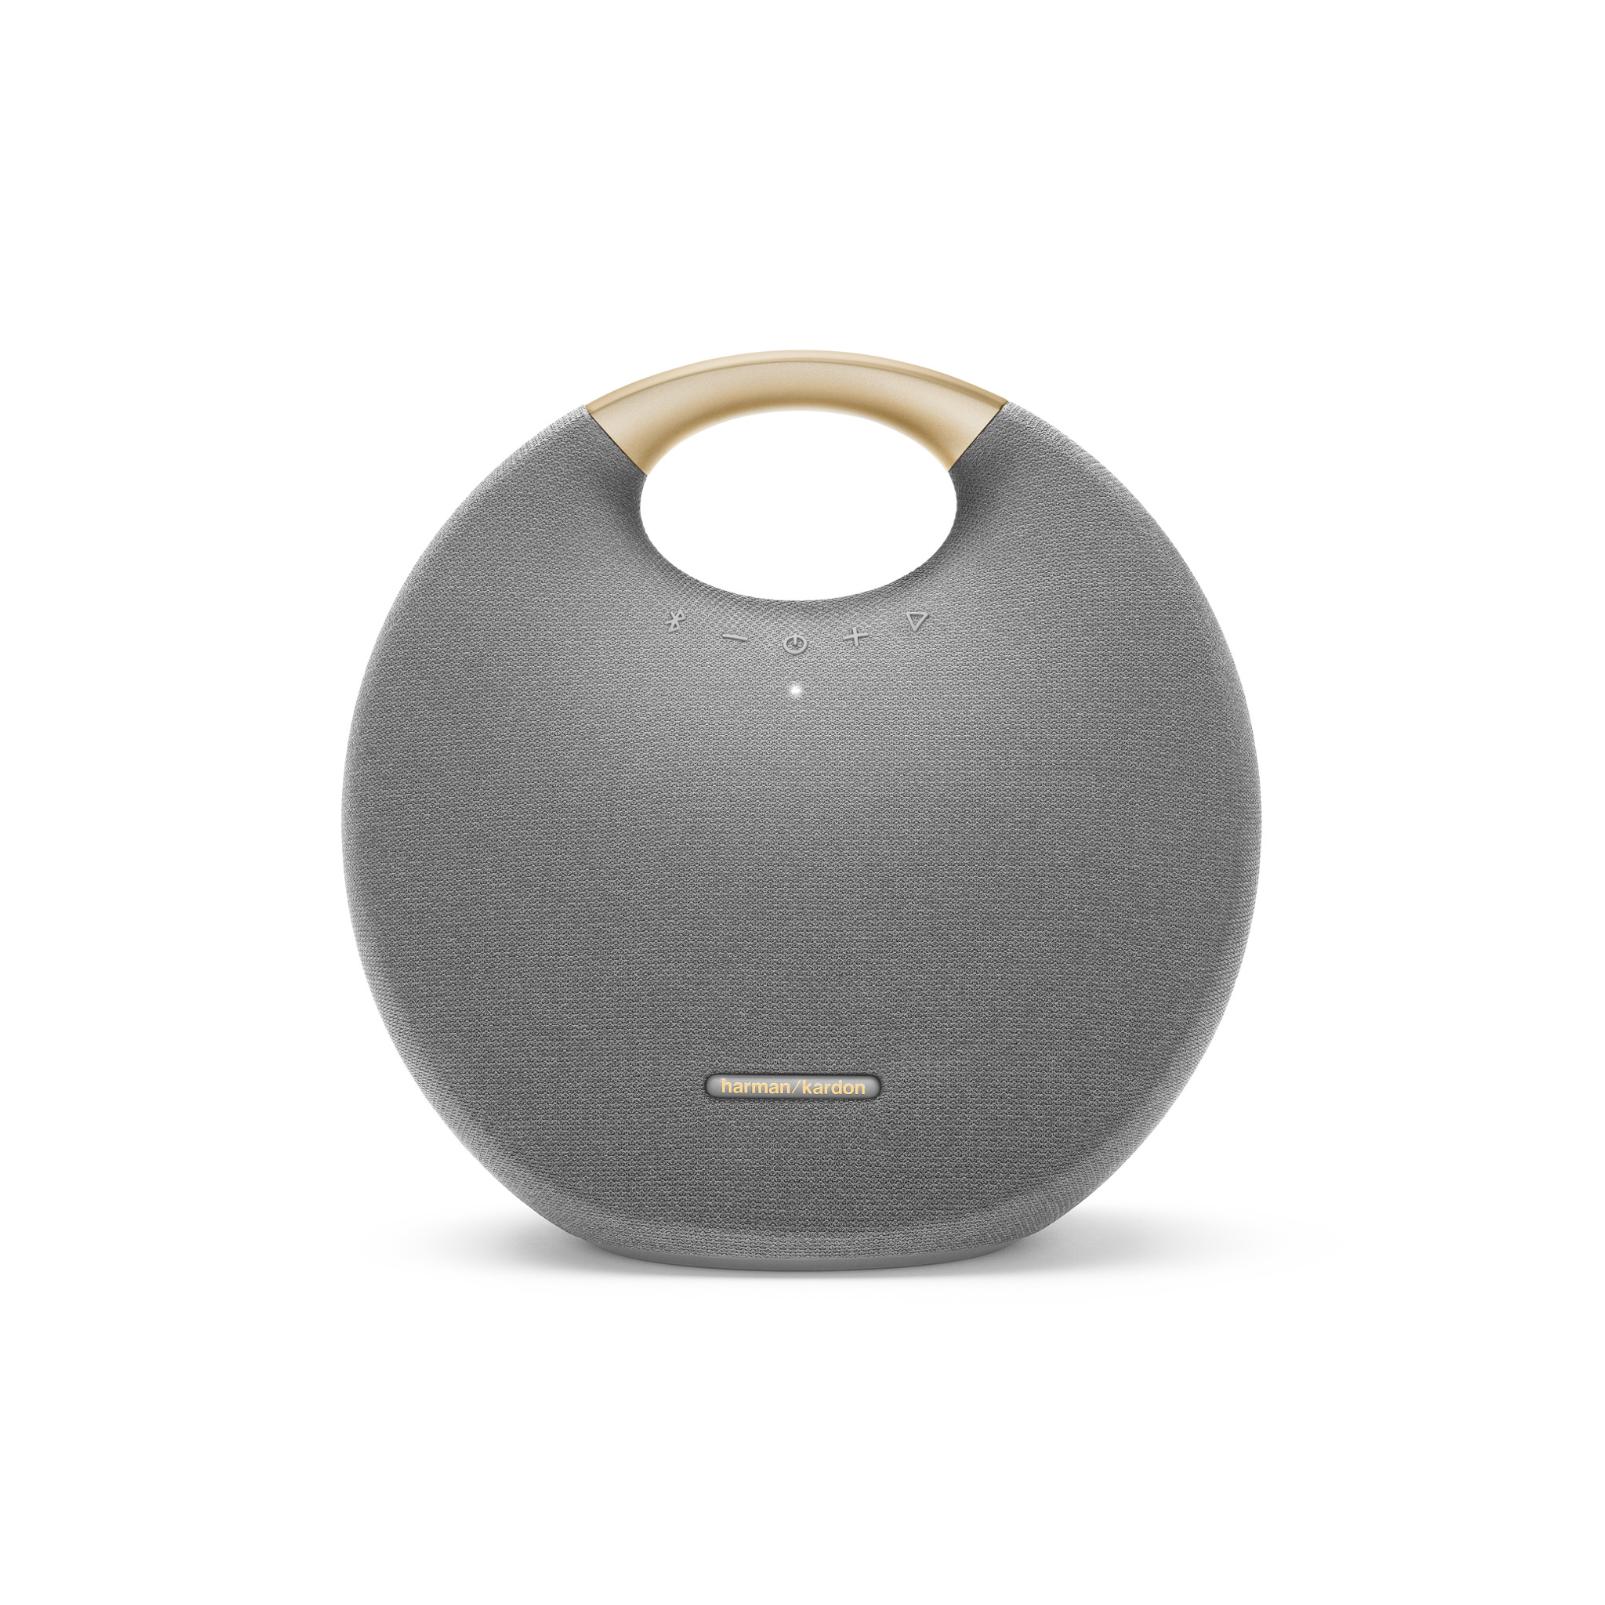 Onyx Studio 6 - Grey - Portable Bluetooth speaker - Hero